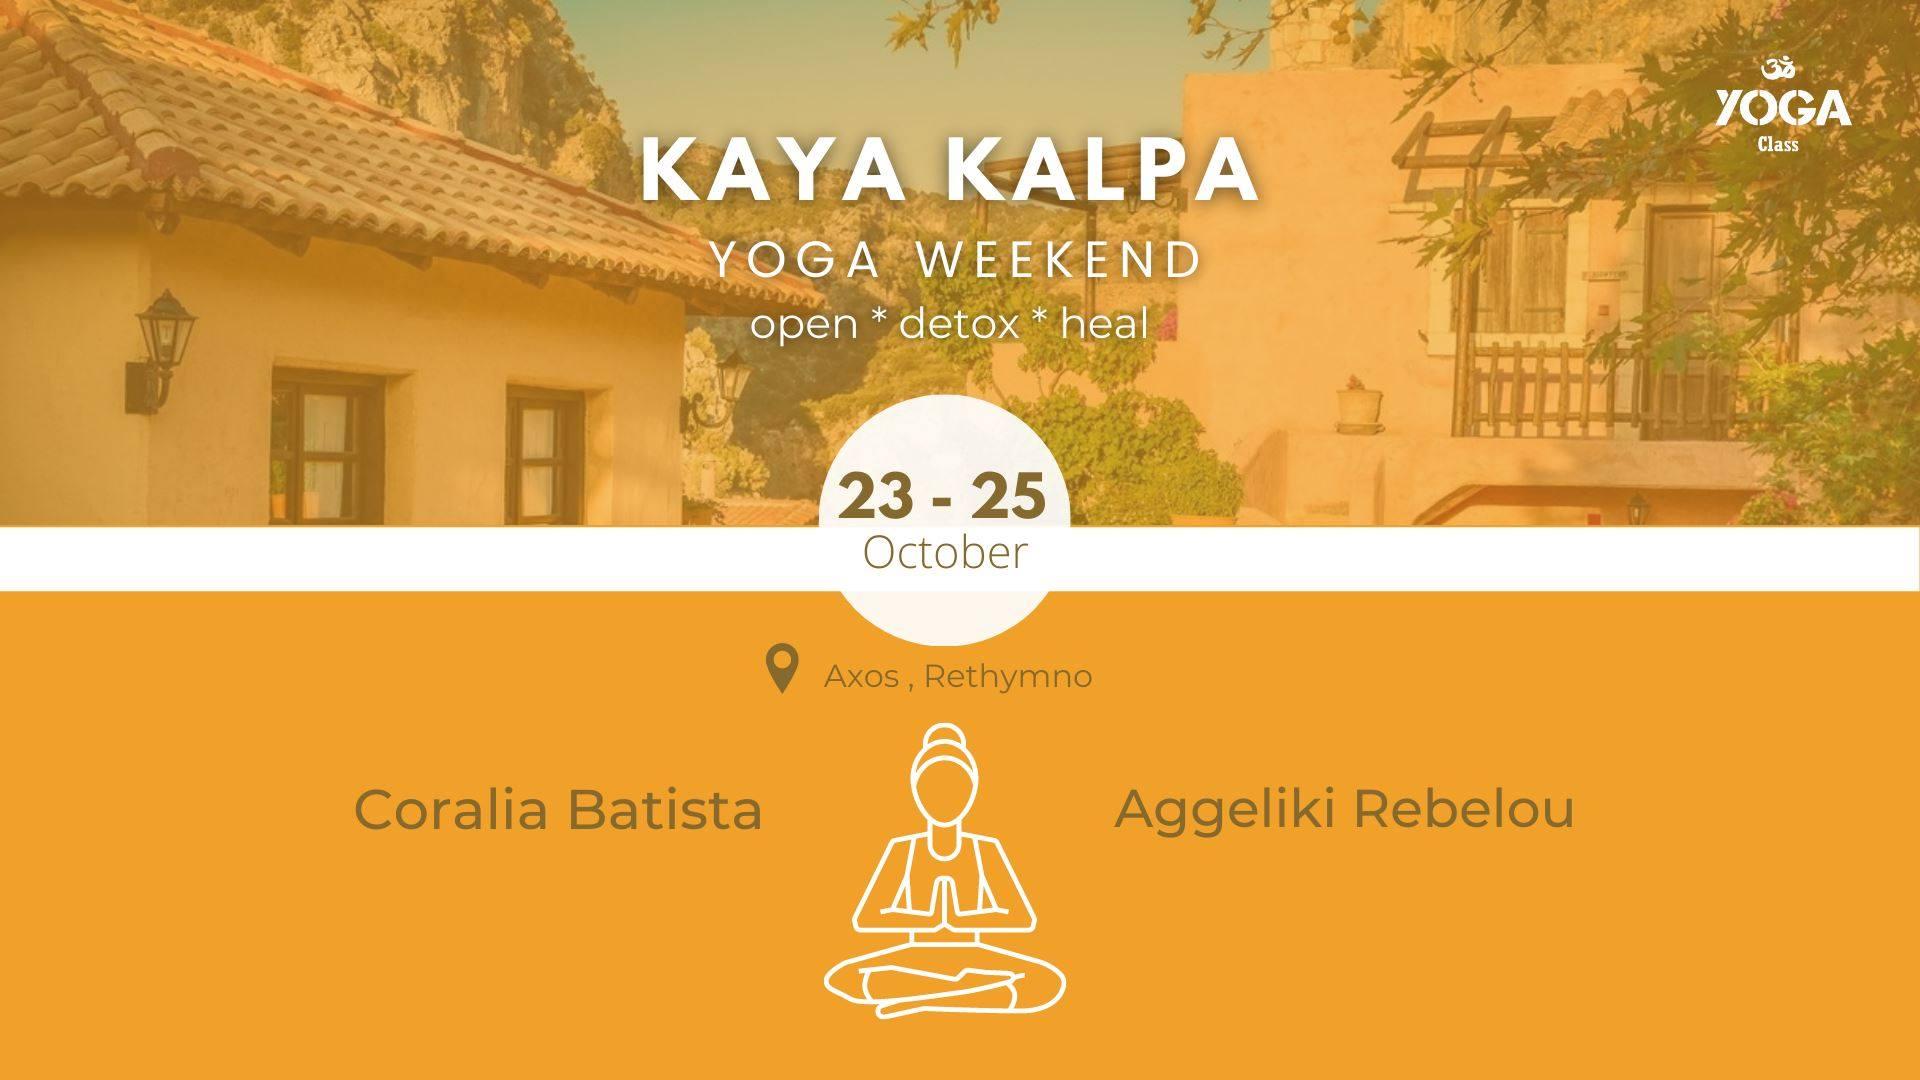 Kaya Kalpa: 3ήμερο retreat Aποτοξίνωσης+Yoga στο Ρέθυμνο – 23-25 Οκτώβρη